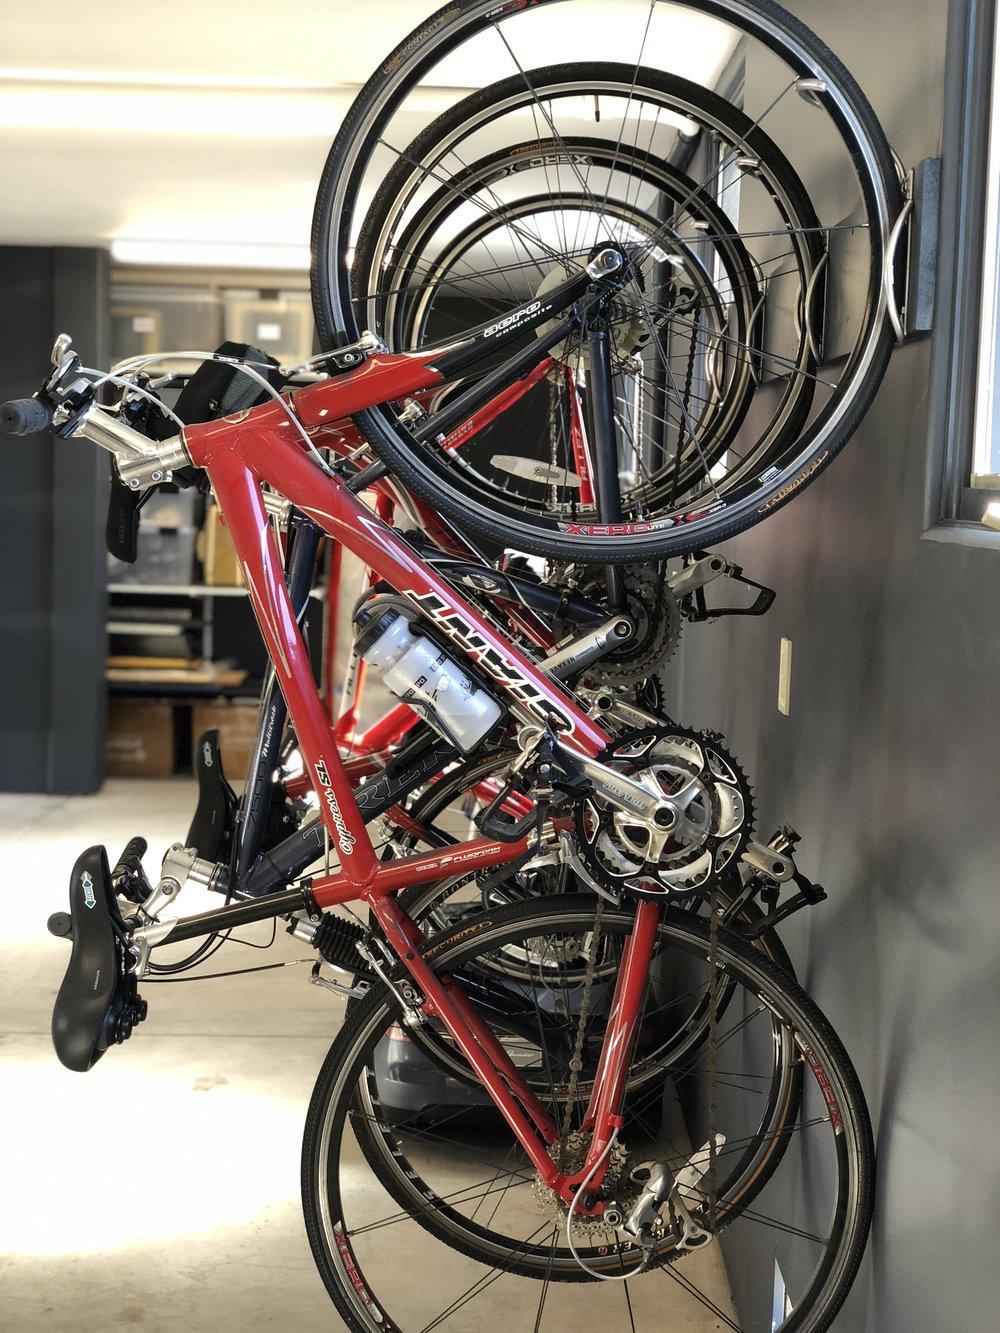 Custom bike storage solution for your garage